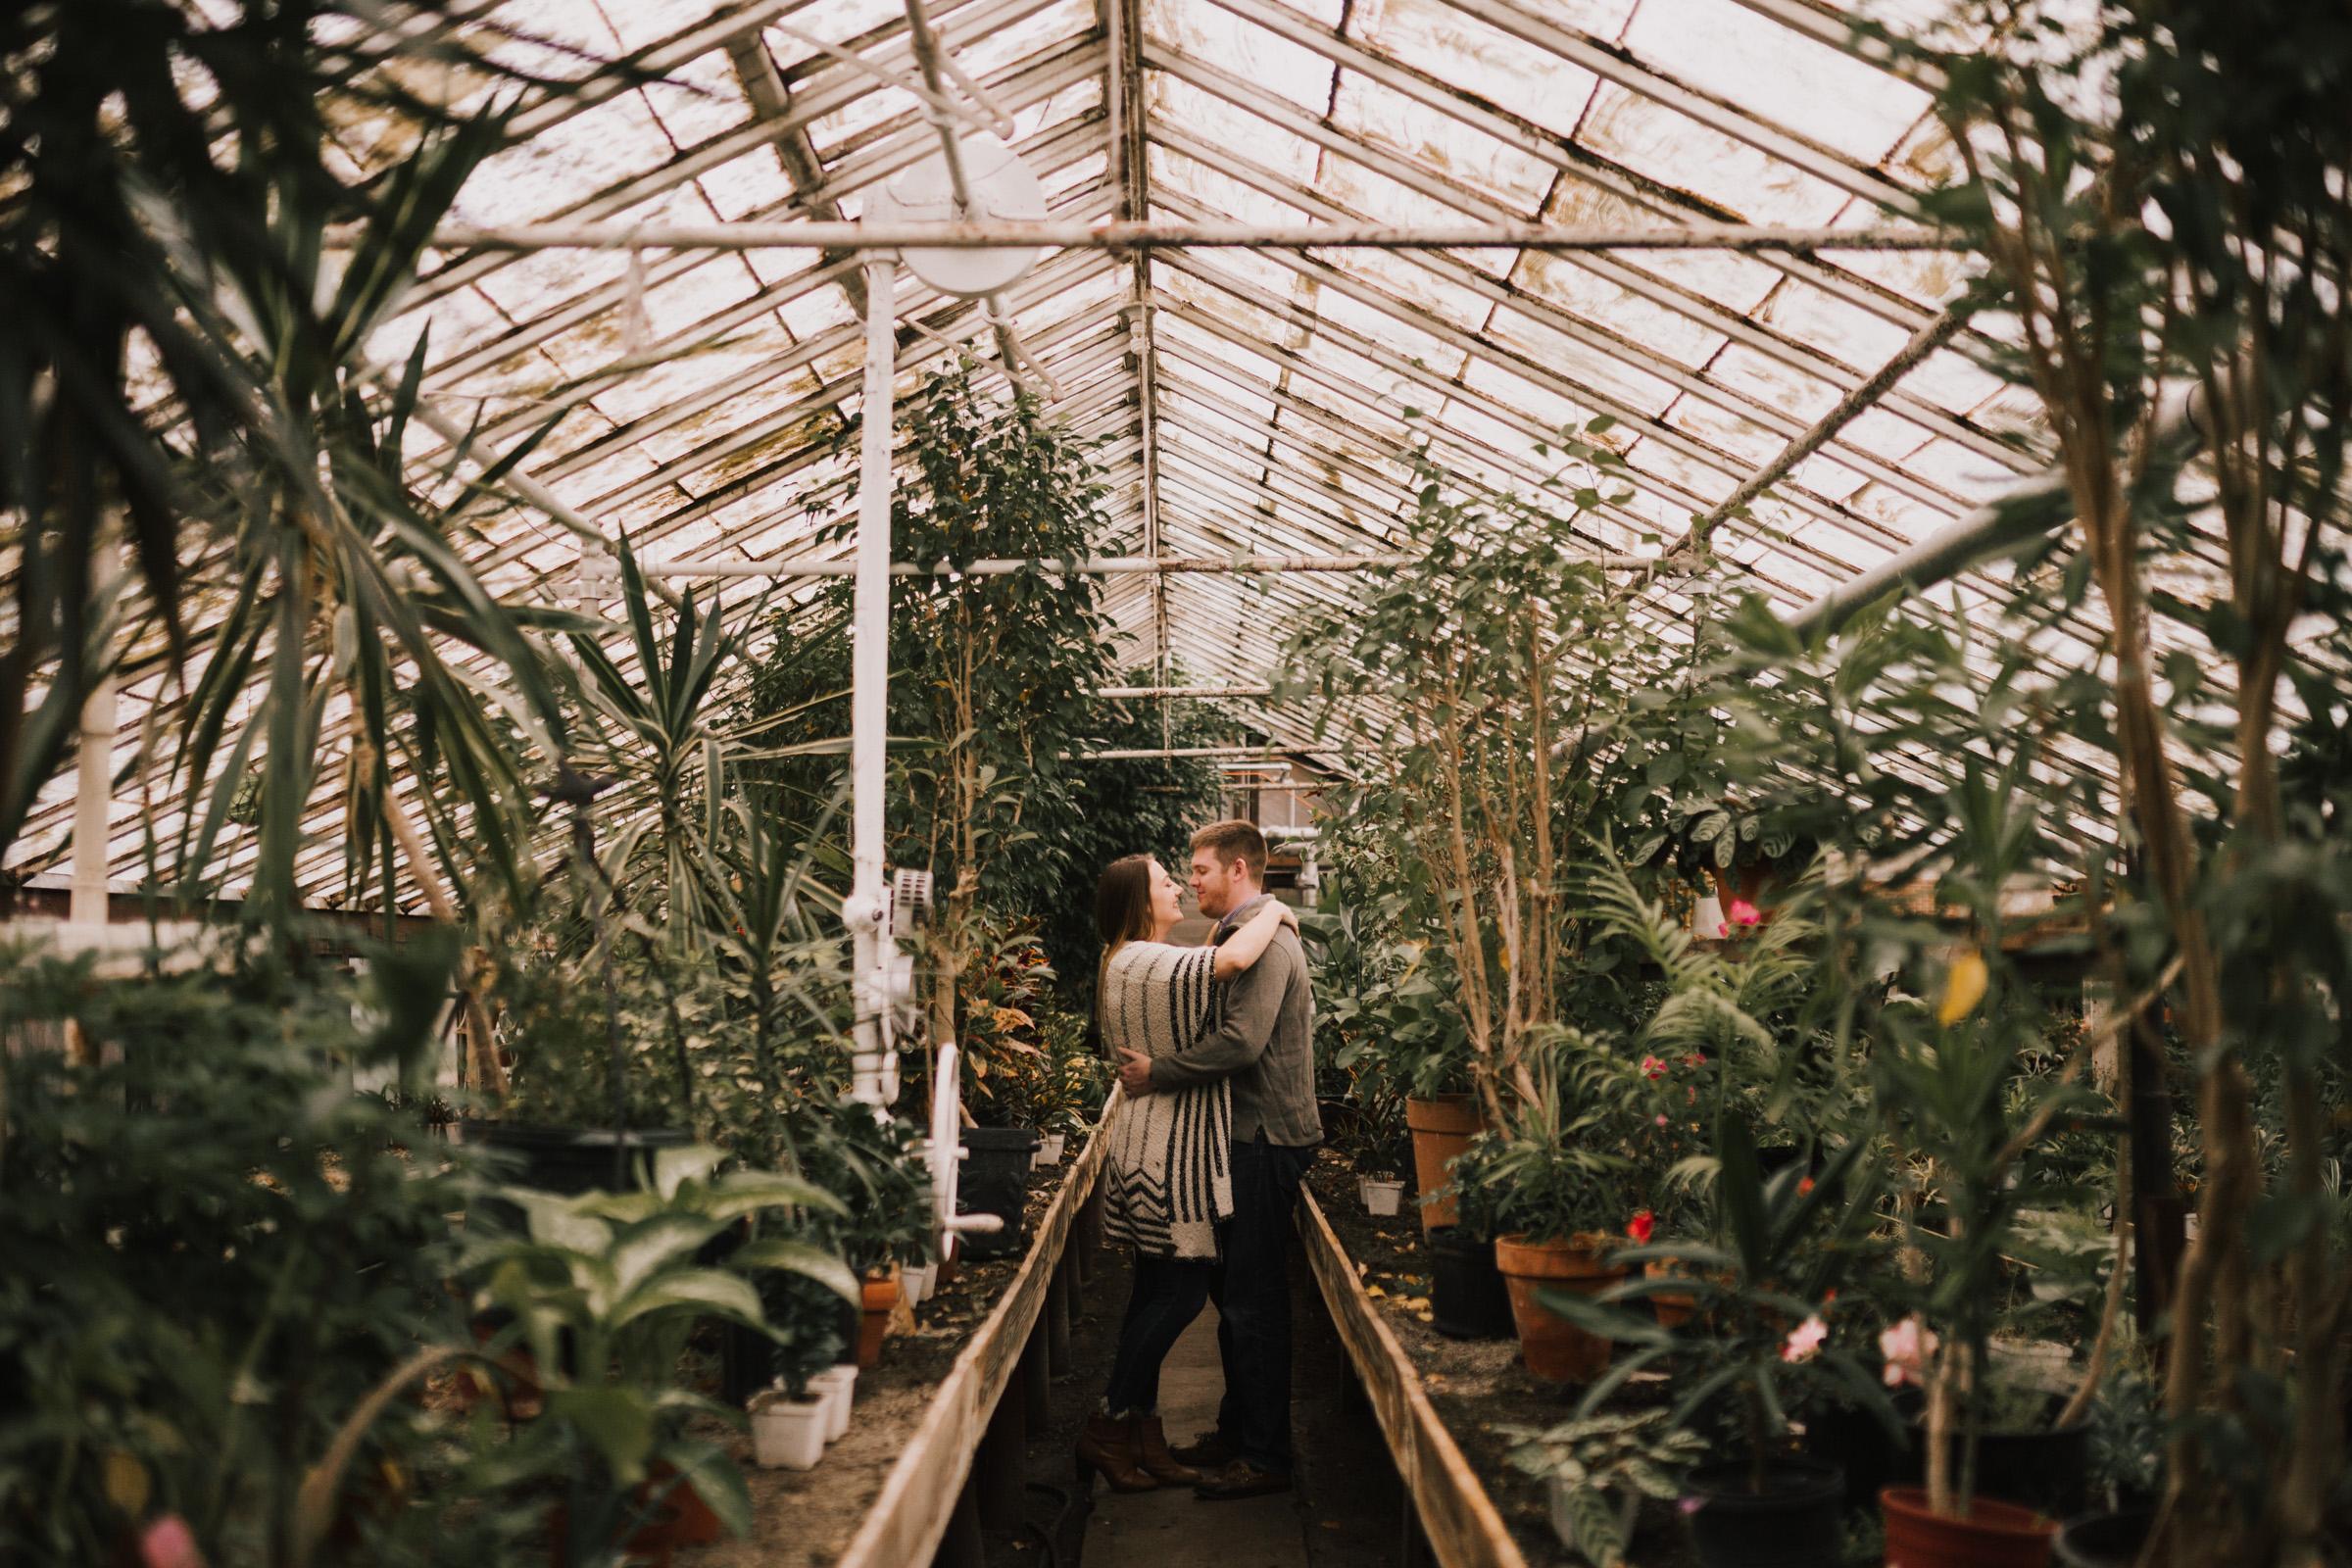 alyssa barletter photography johns greenhouse kansas city missouri brookside waldo engagement session winter-16.jpg